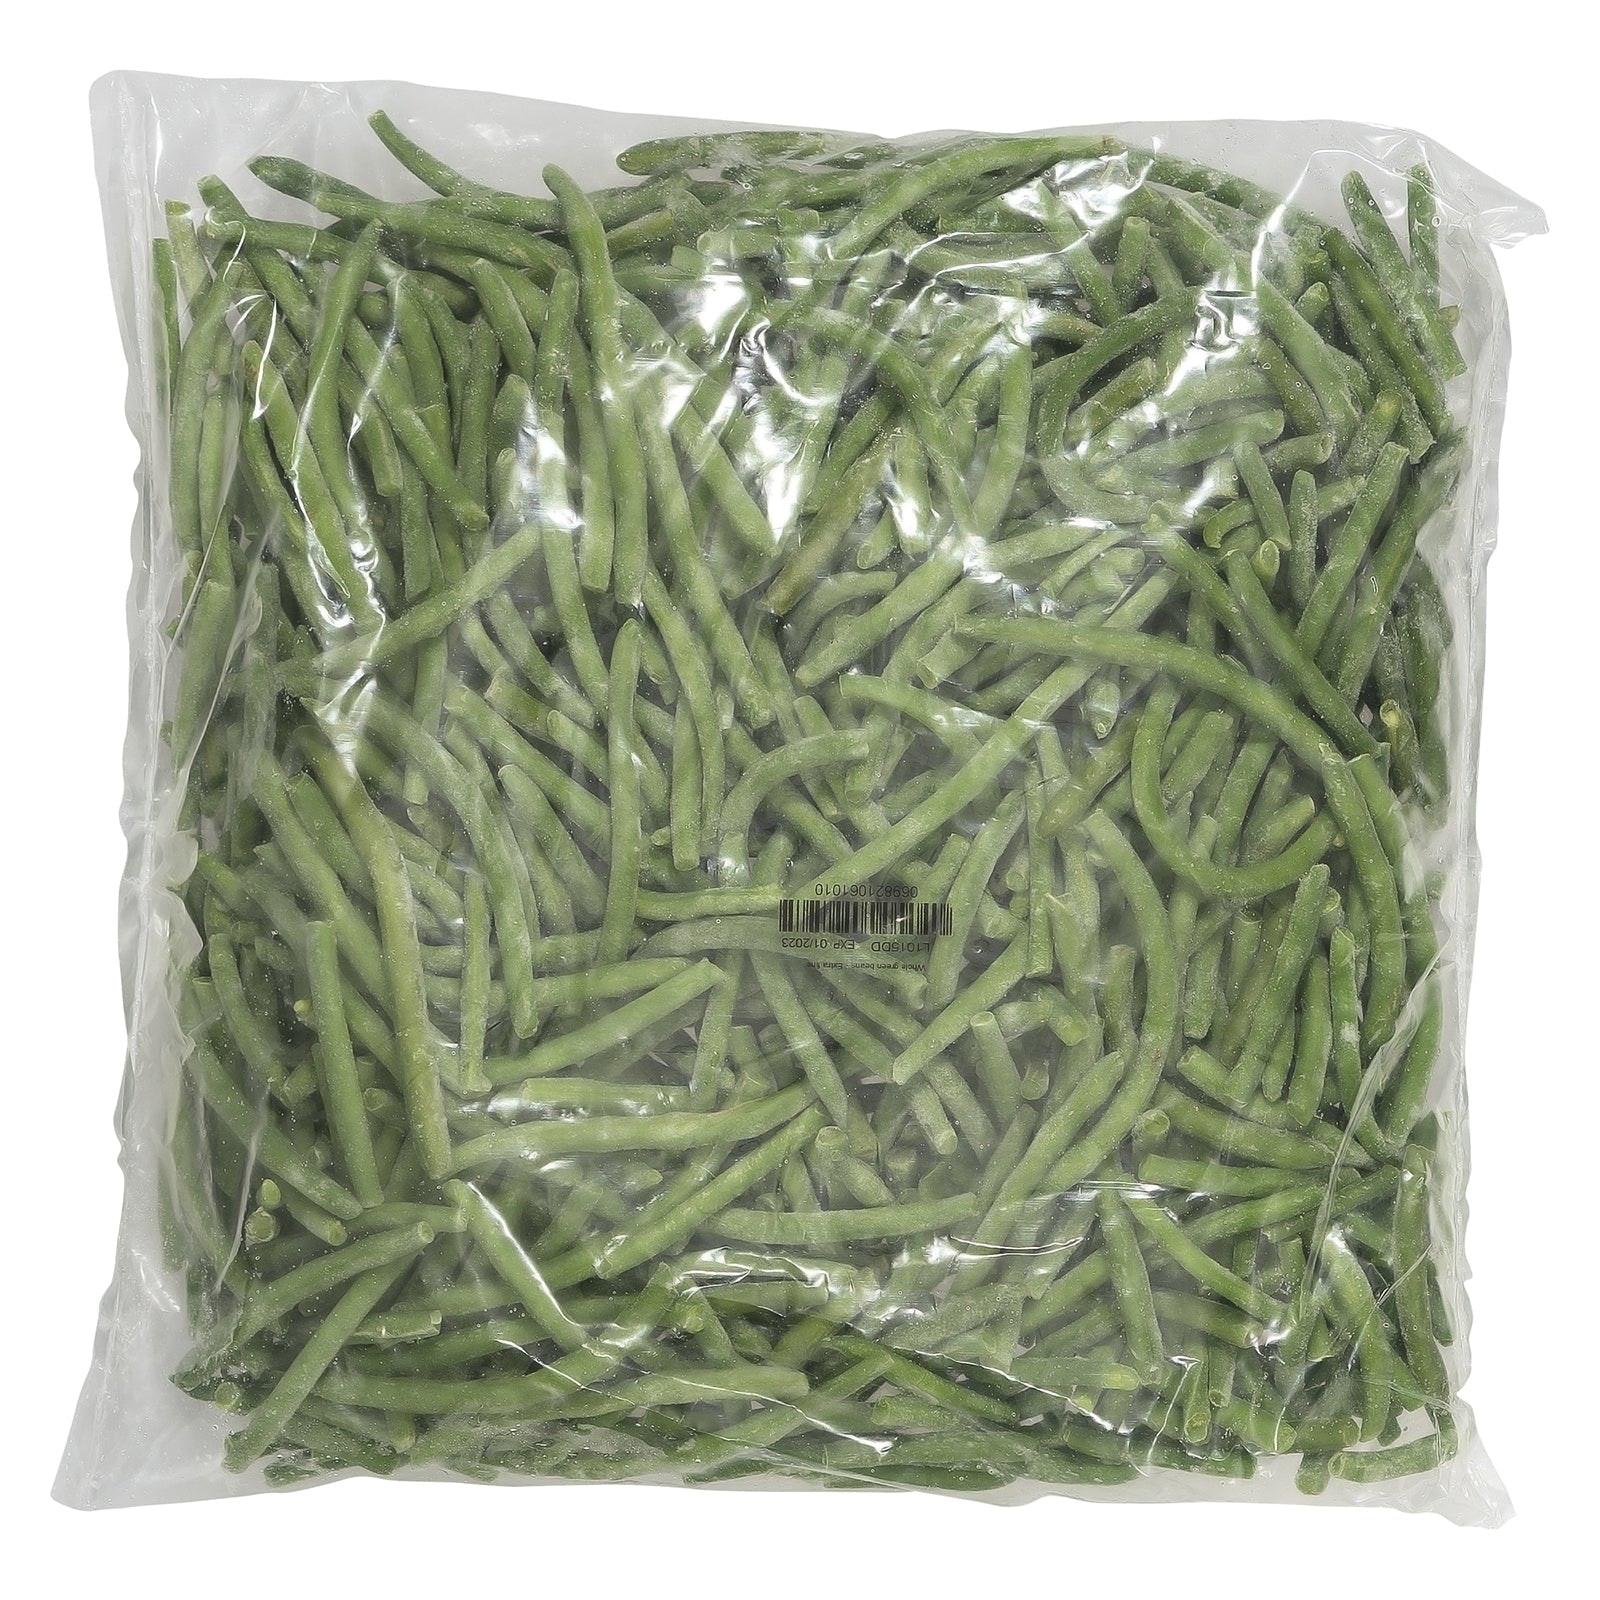 BELOW ZERO Whole extra fine green beans